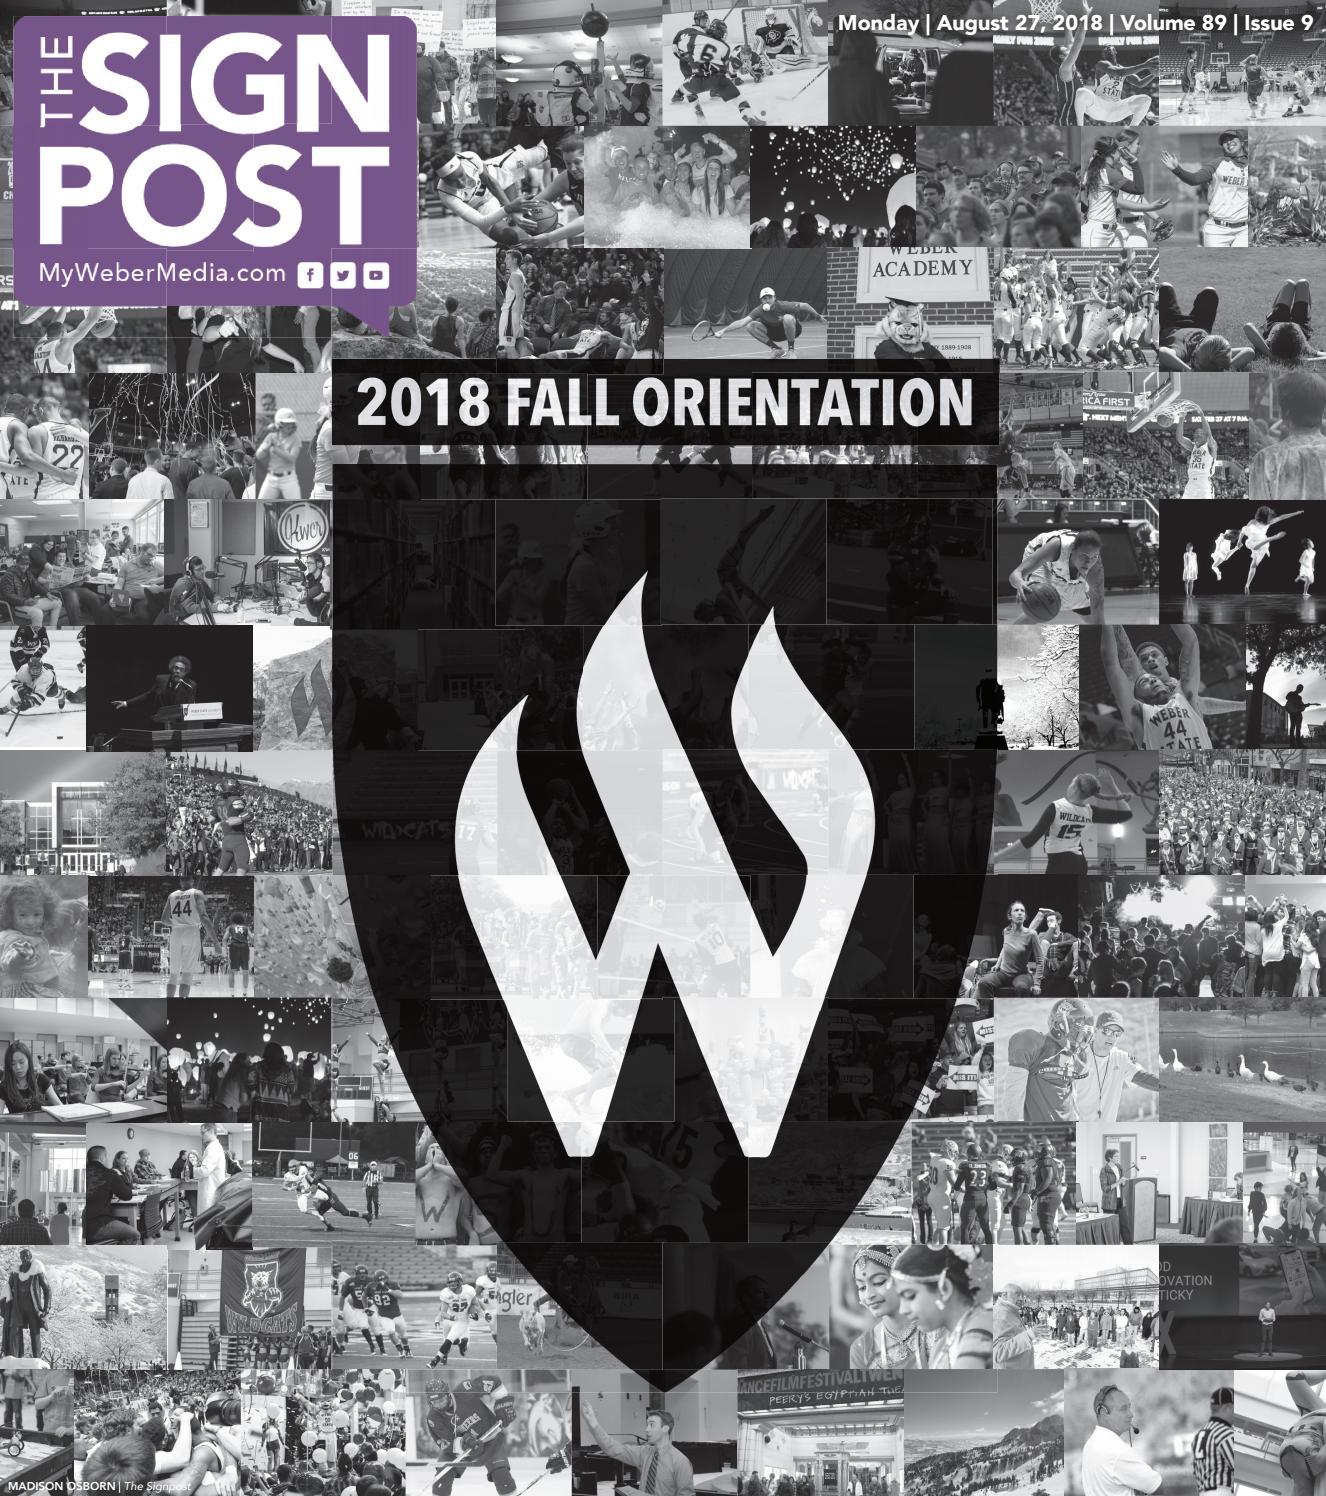 Weber state university gay straight alliance